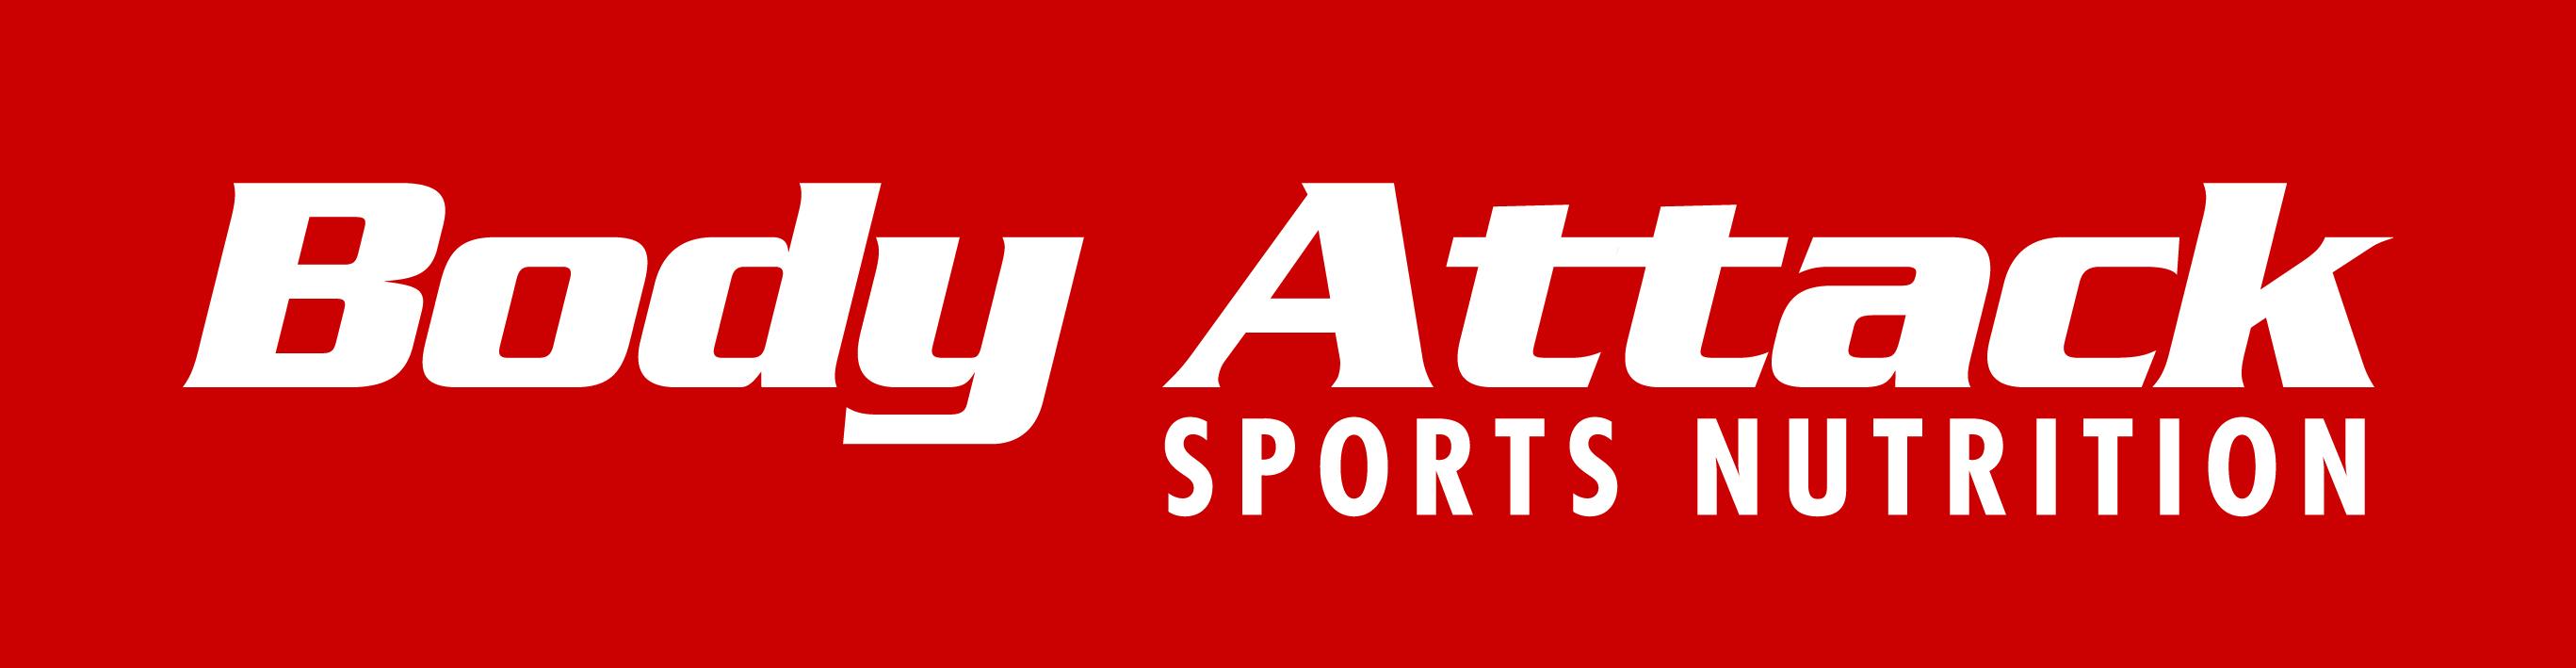 Body Attack Premium Store München-Schwabing